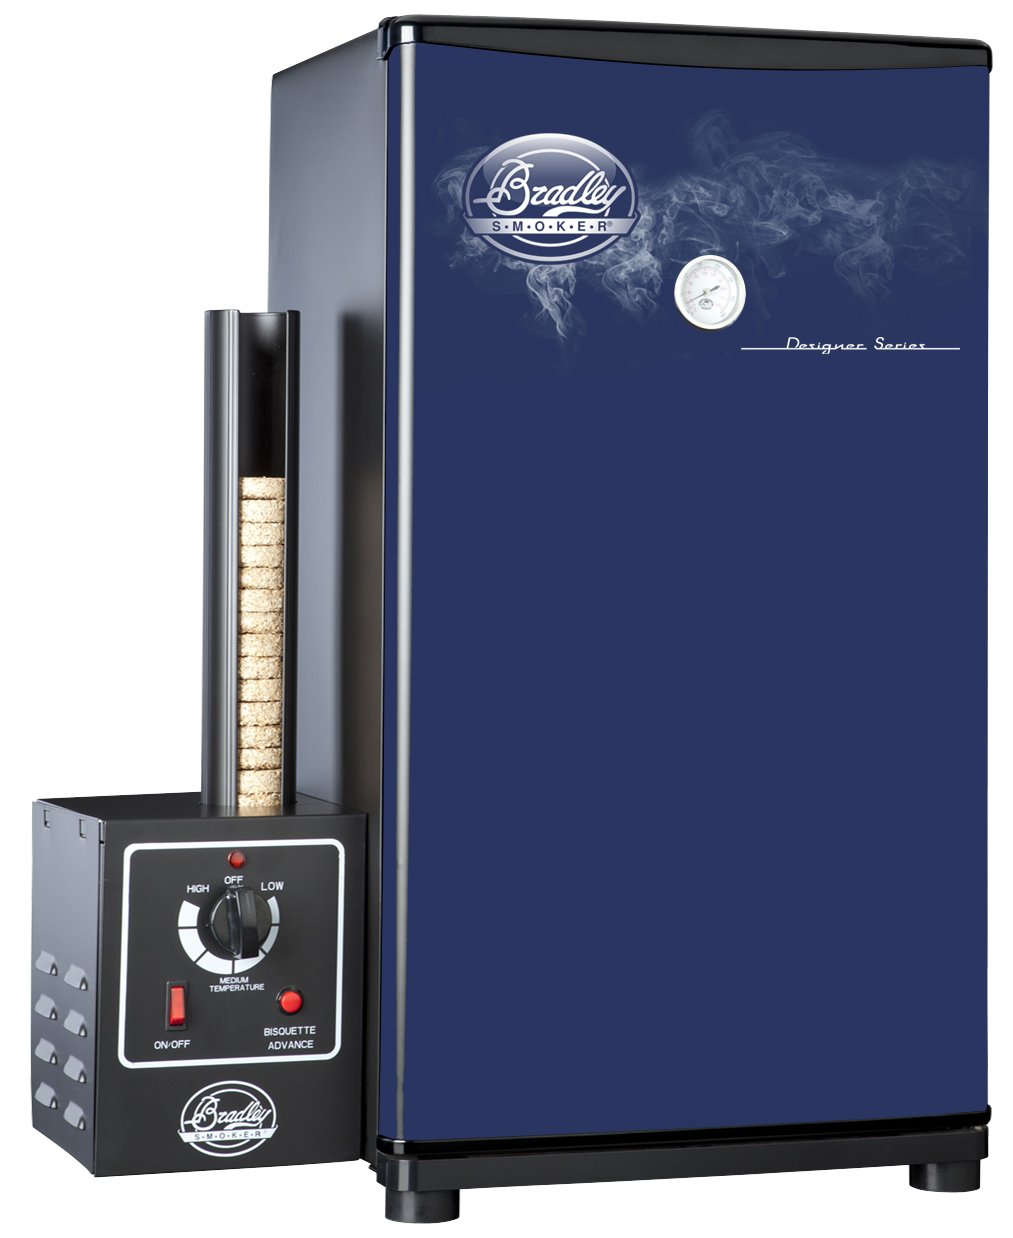 Bradley Technologies Designer Series 4 Rack Original Smoker Stove, Blue by Bradley Smoker